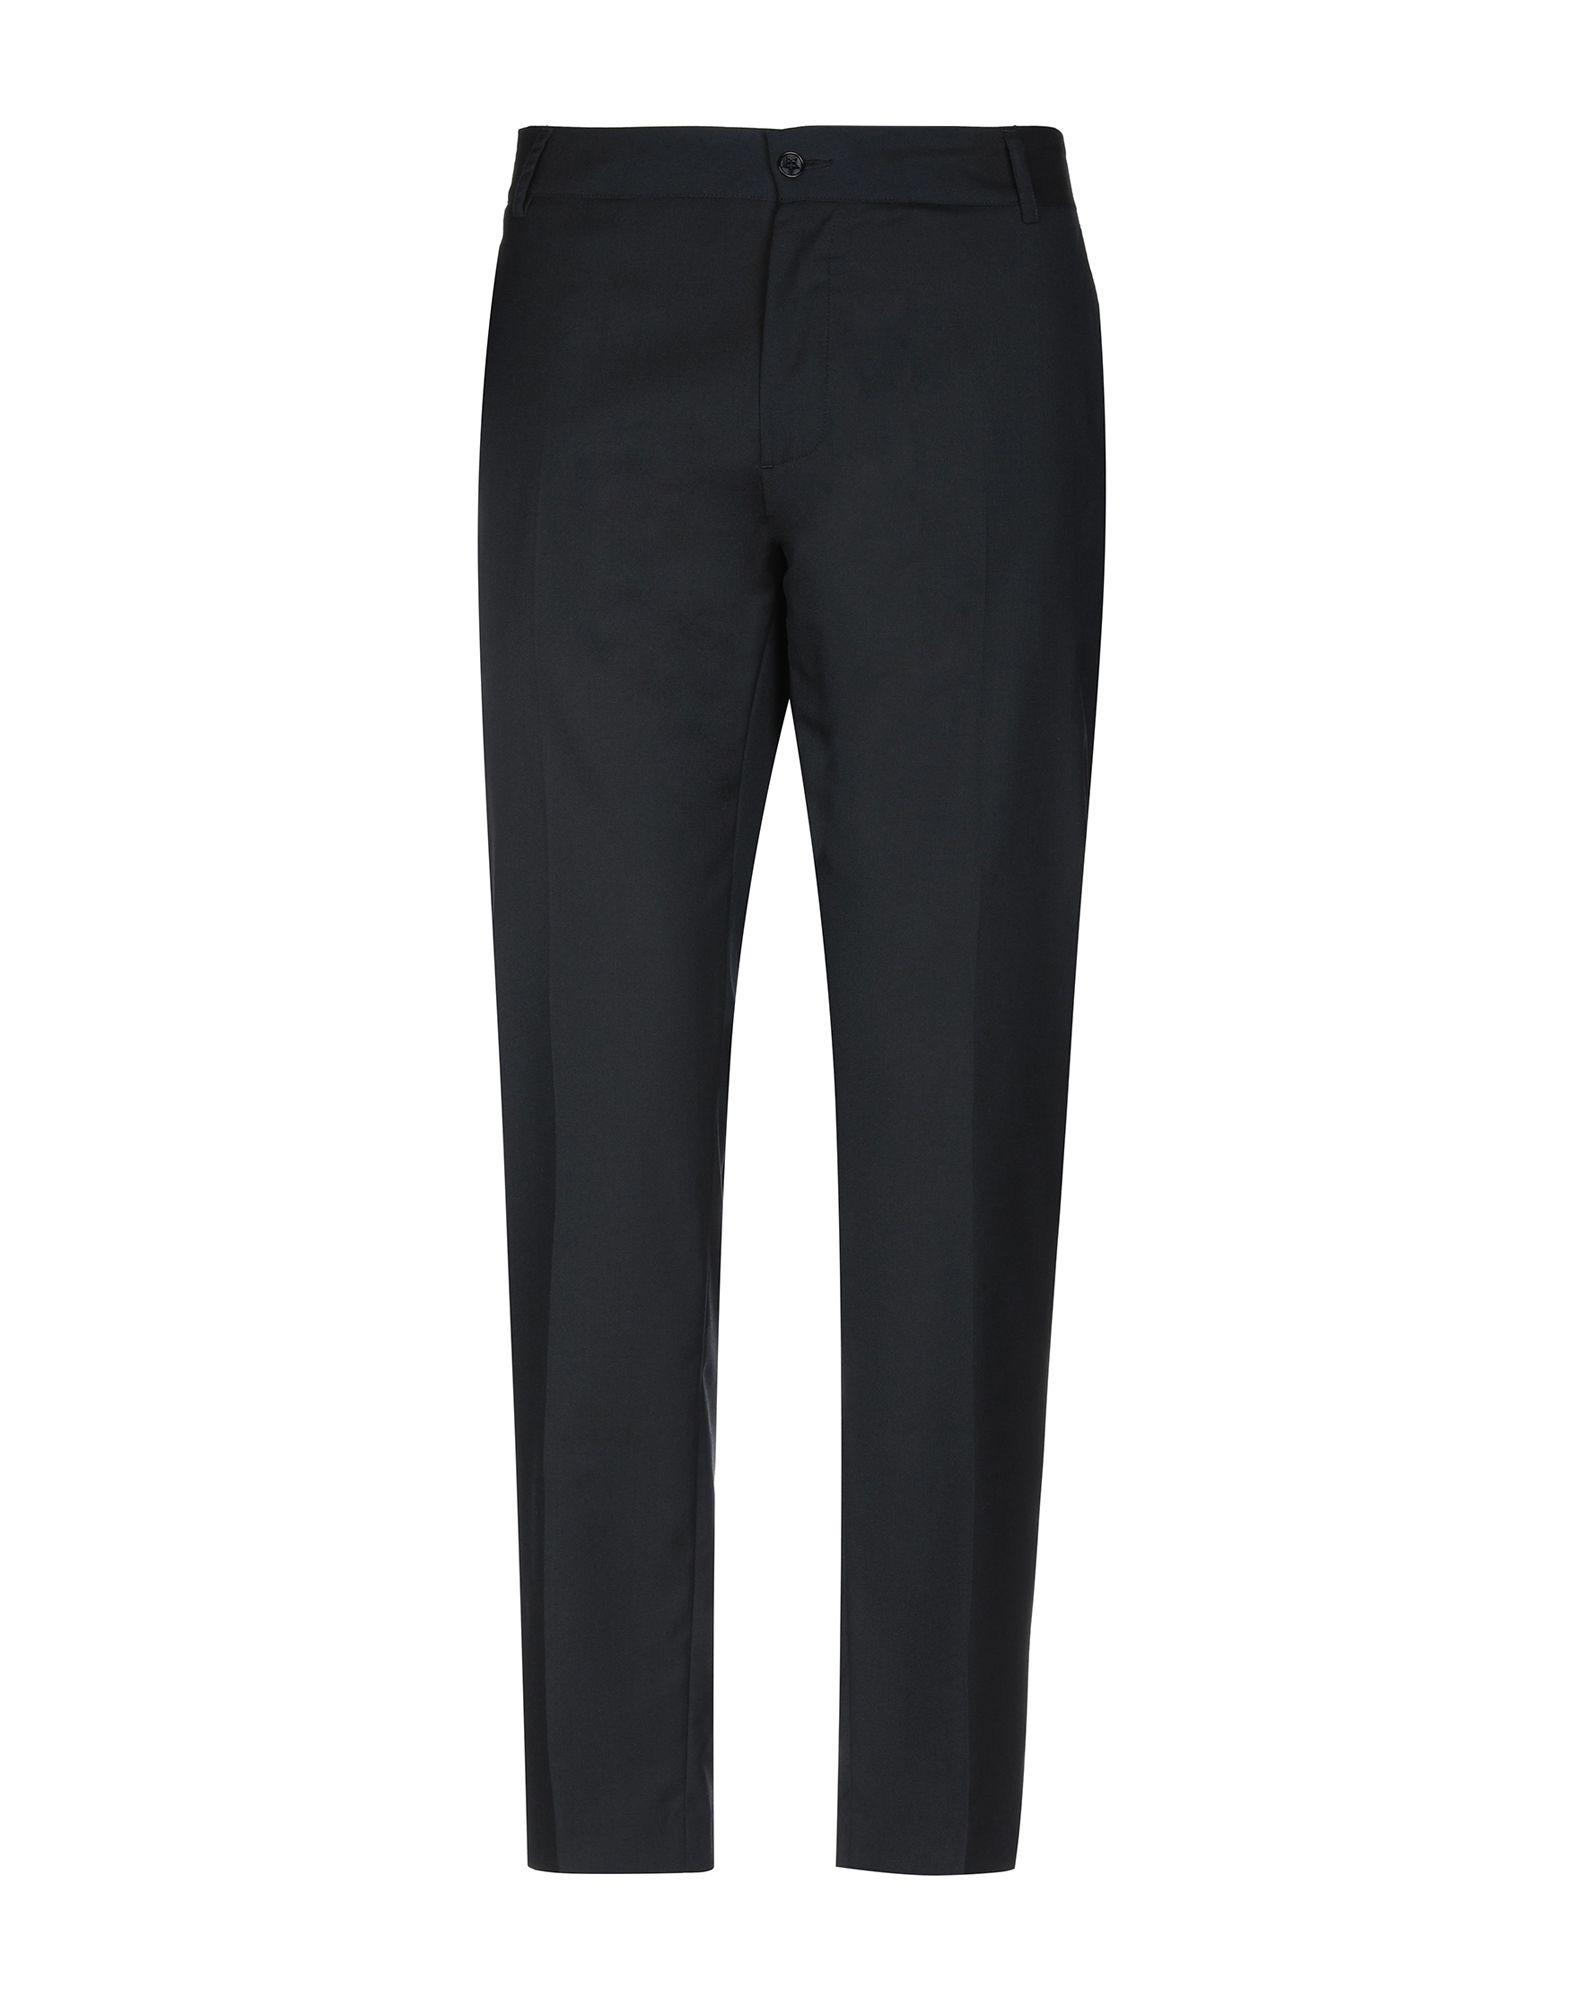 Pantalone Pantalone Pantalone Daniele Alessandrini uomo - 13238961WJ 8db